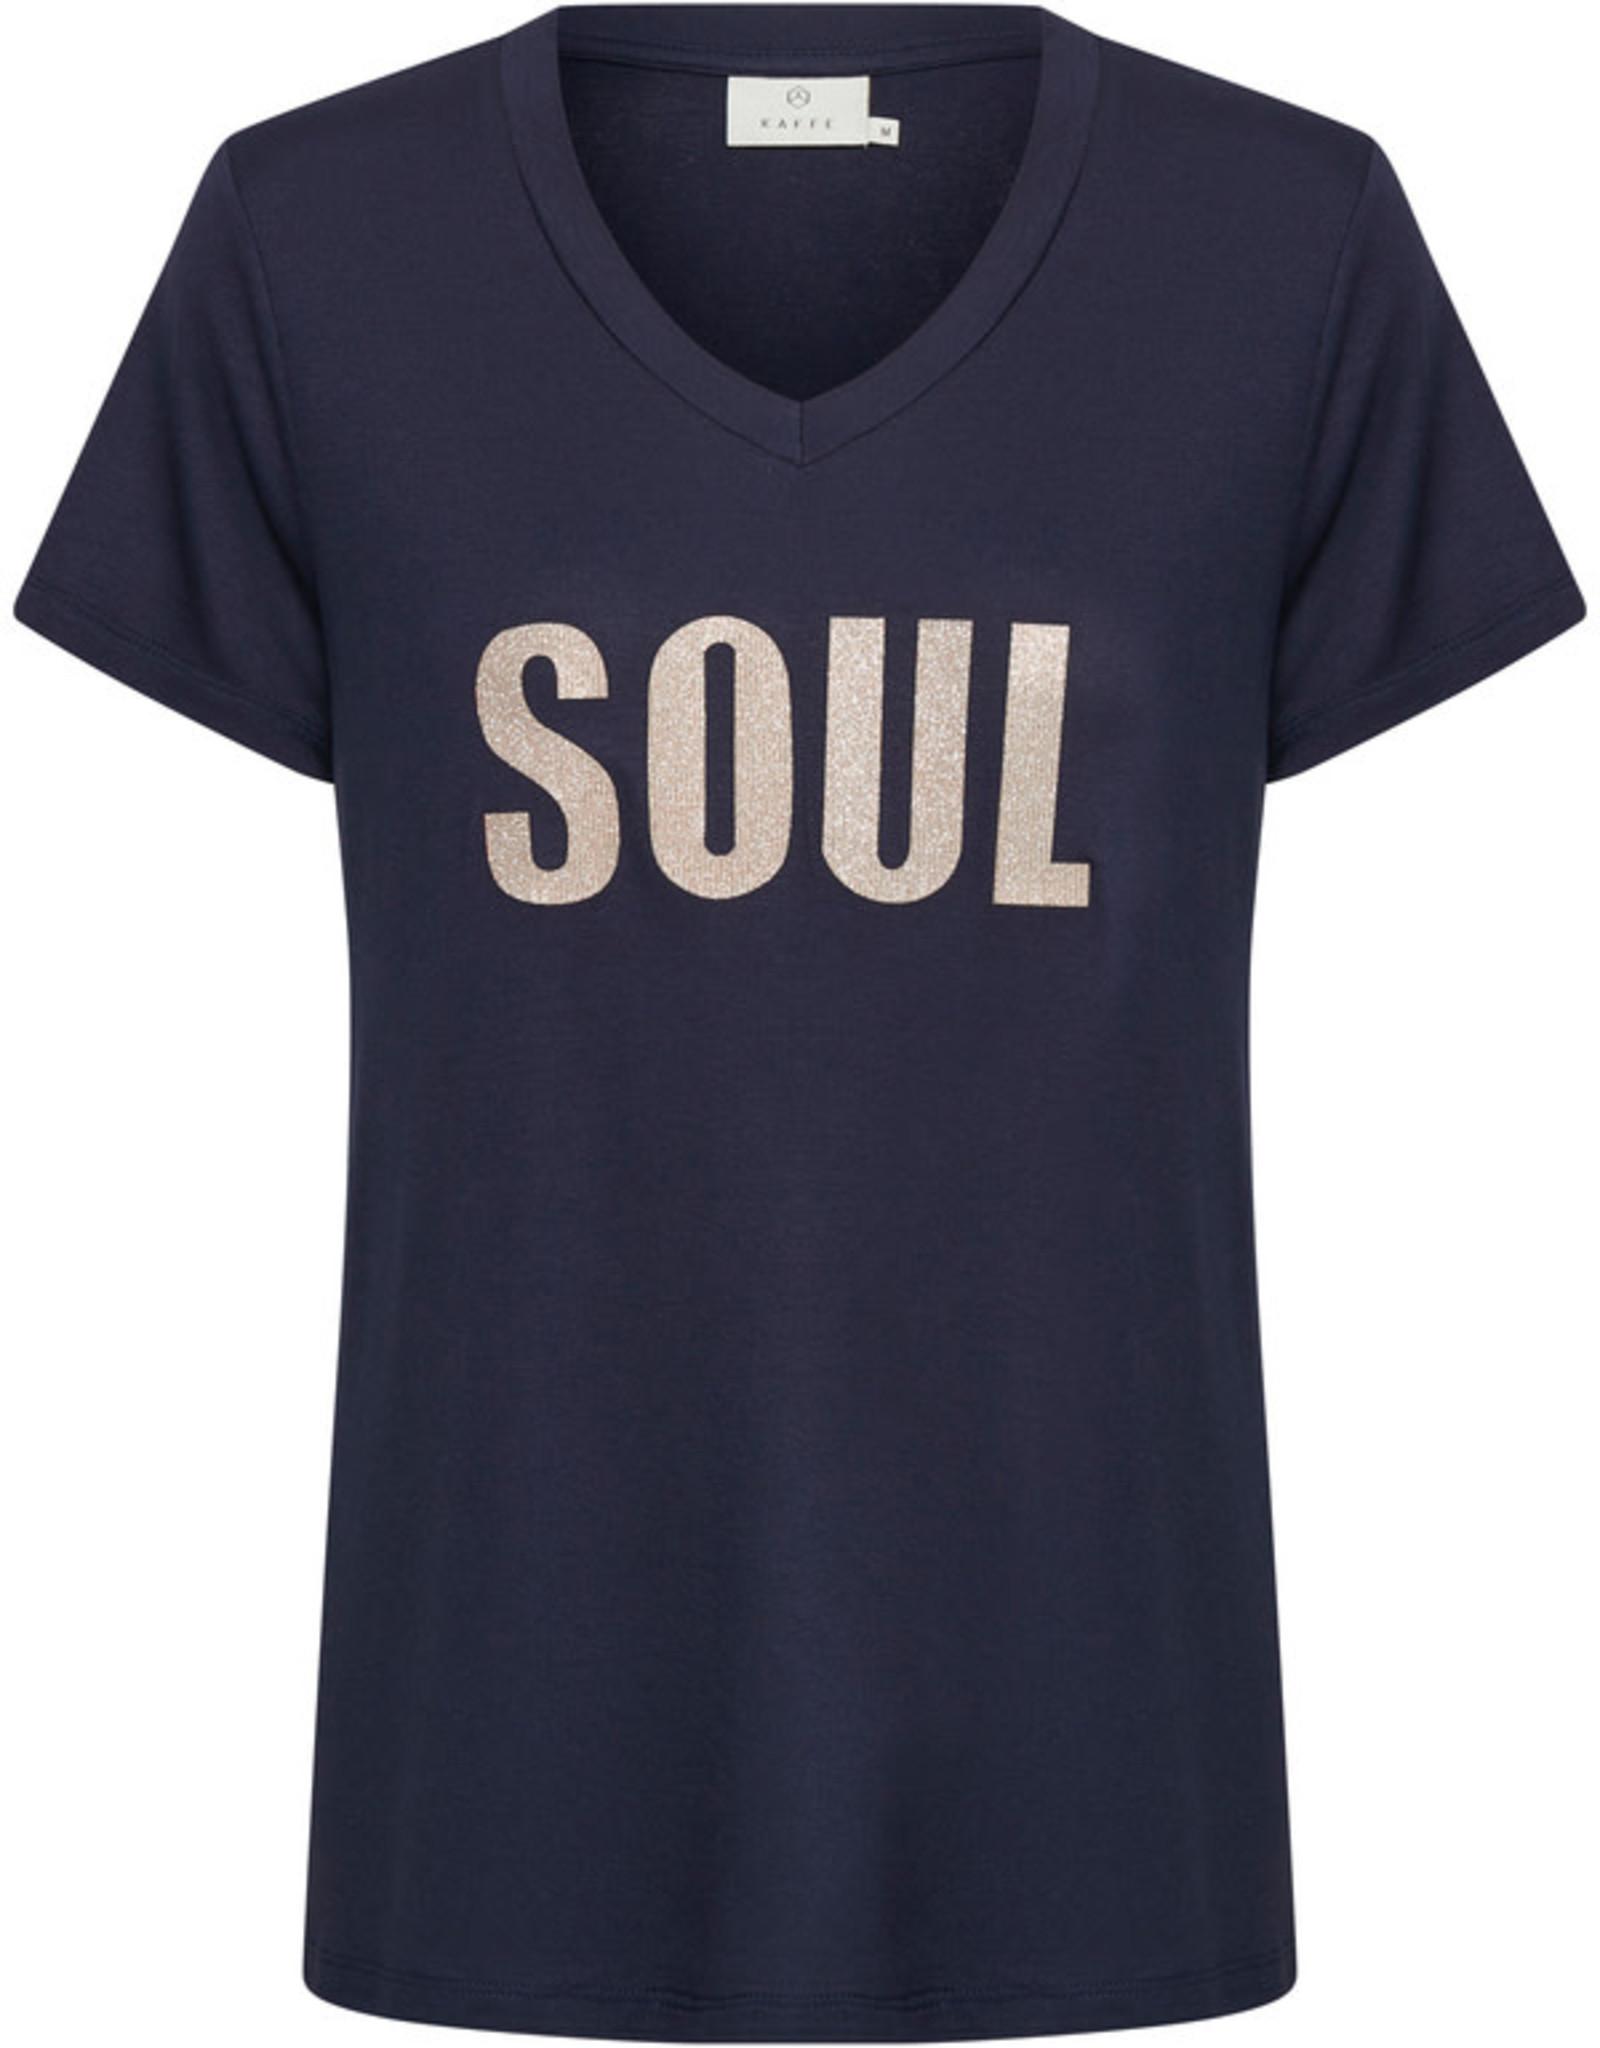 Kaffé Kaffé- Kasoul T-Shirt